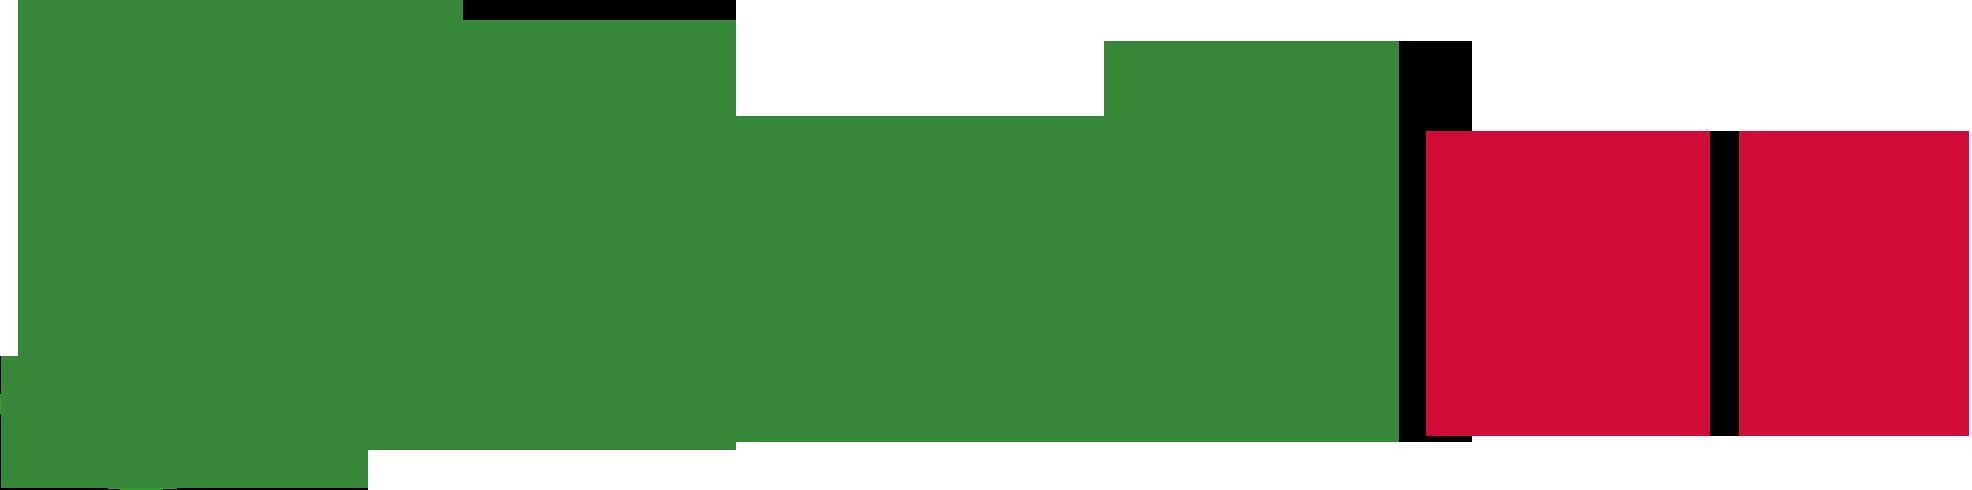 Logga Ekoll AB, transparent